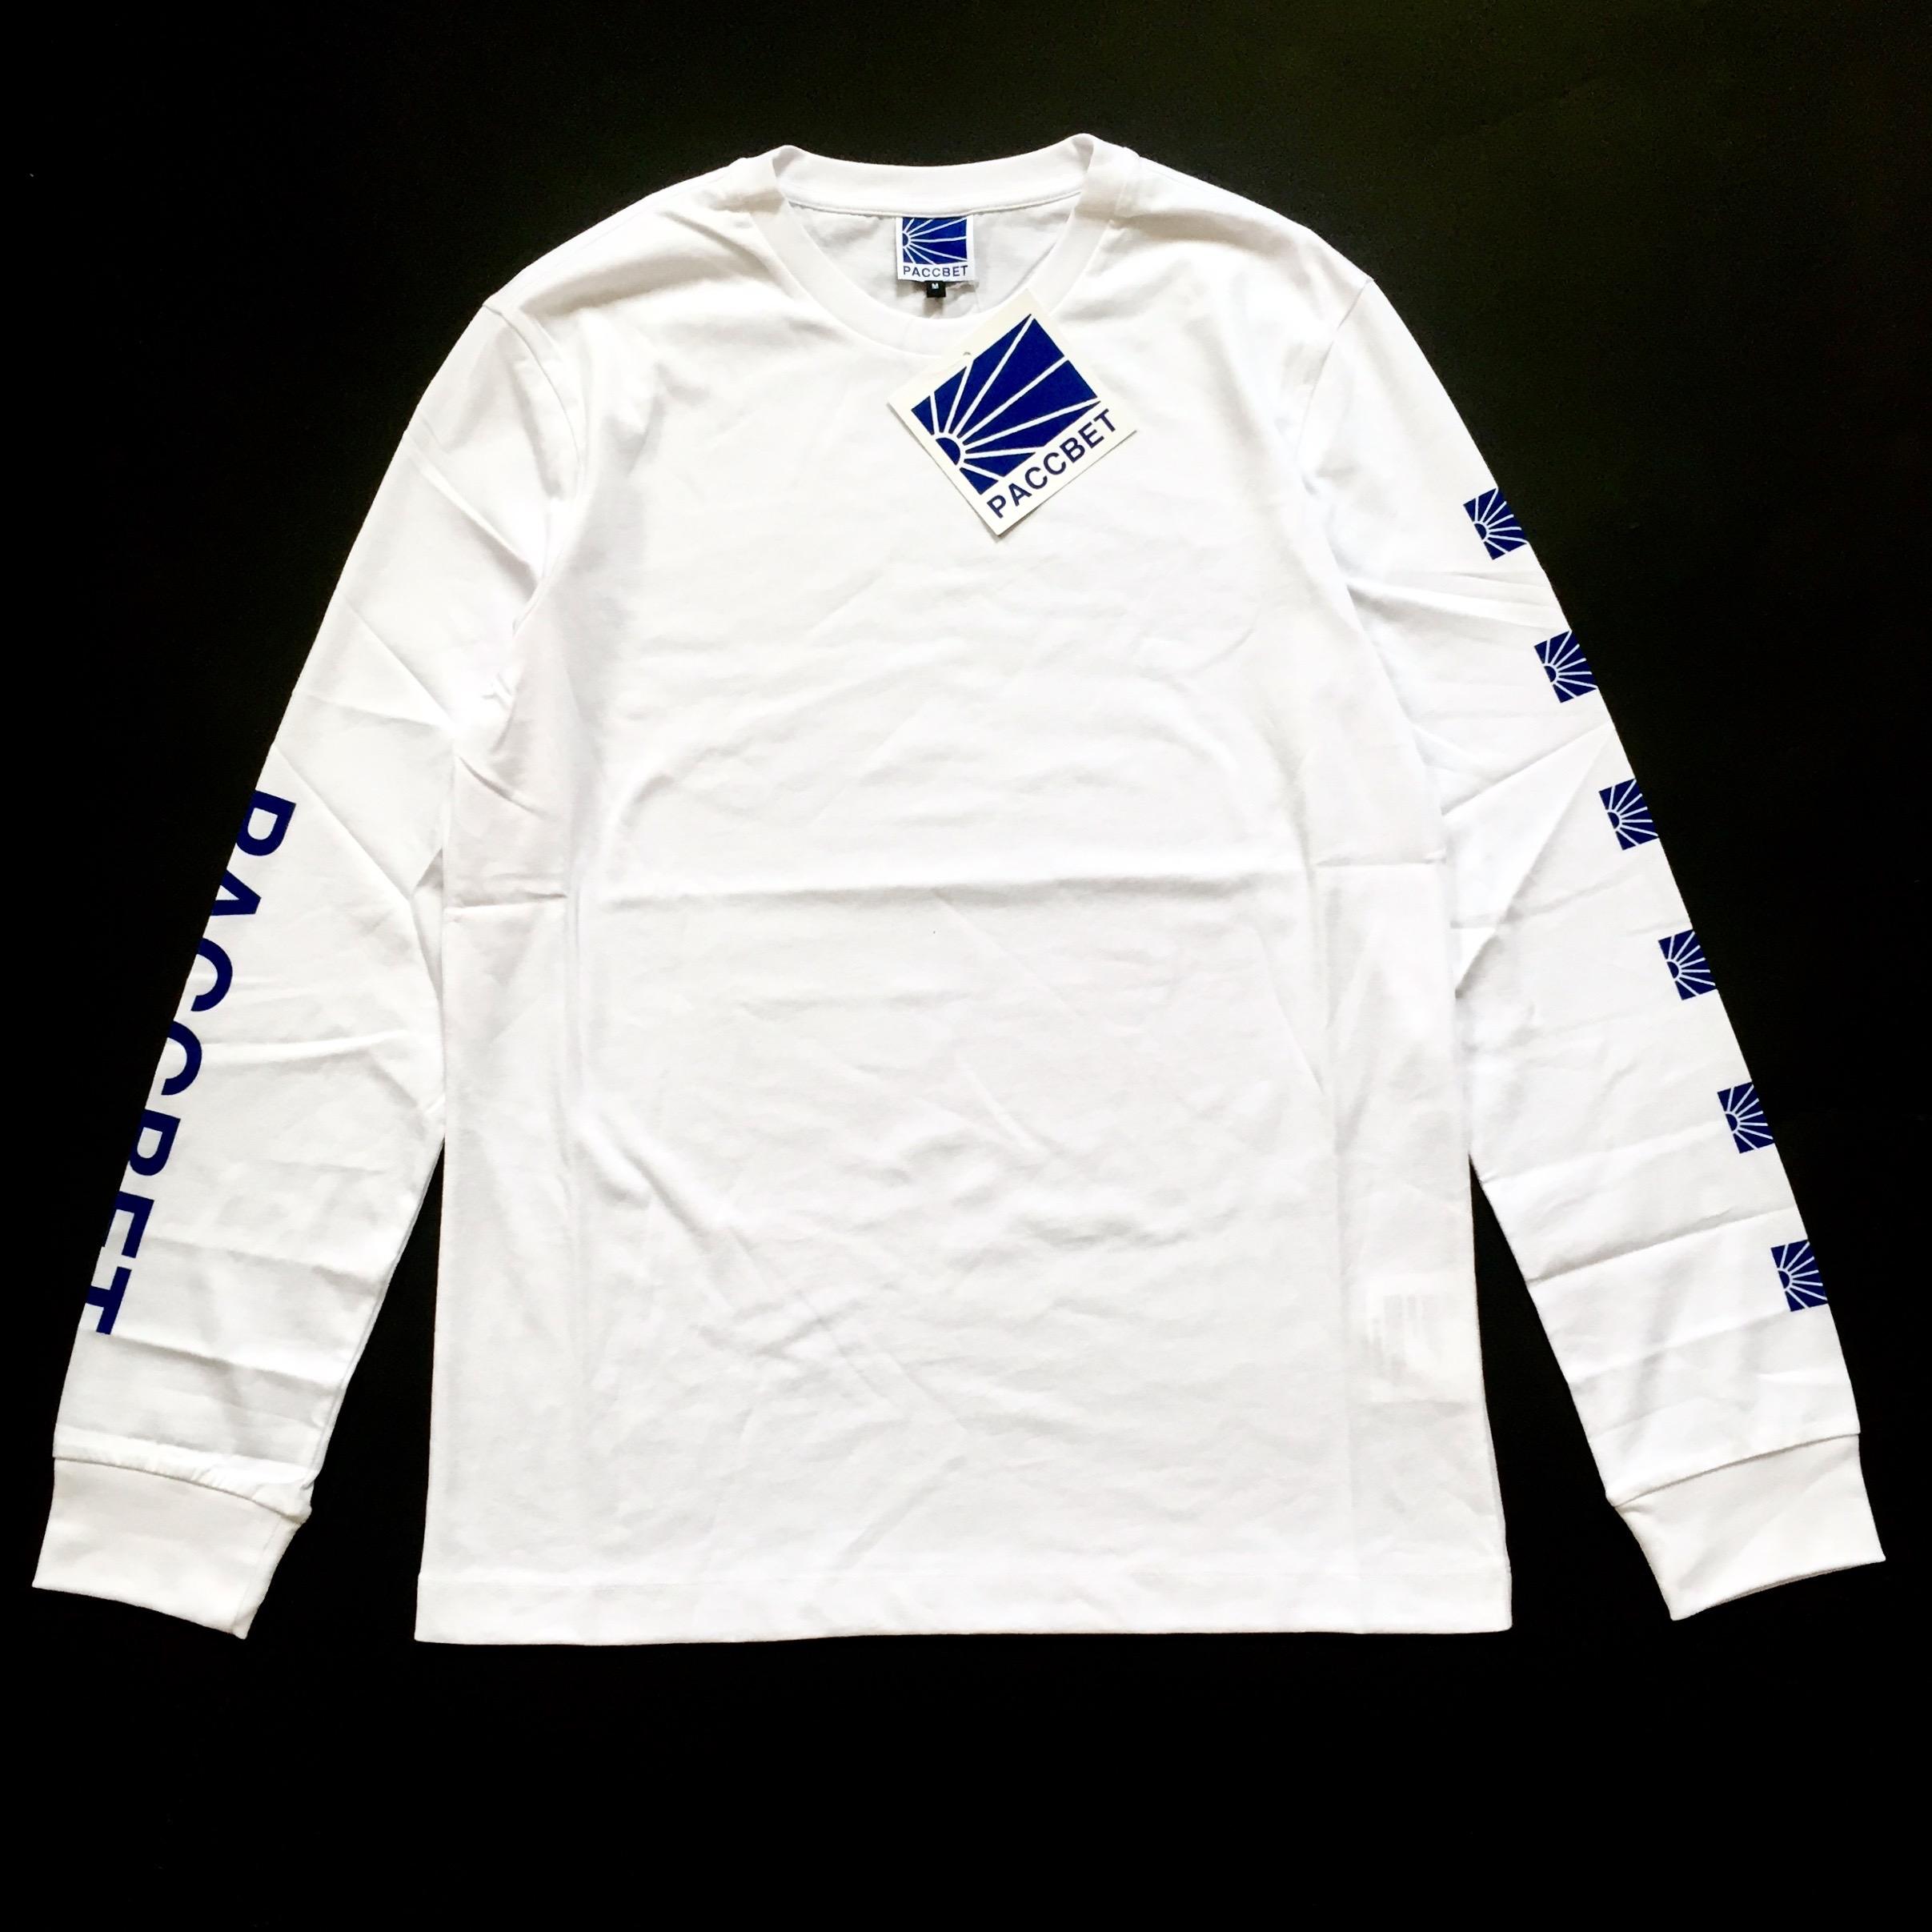 cfa025d96 Gosha Rubchinskiy White Paccbet Dawn Logo T-shirt Nwt | Grailed